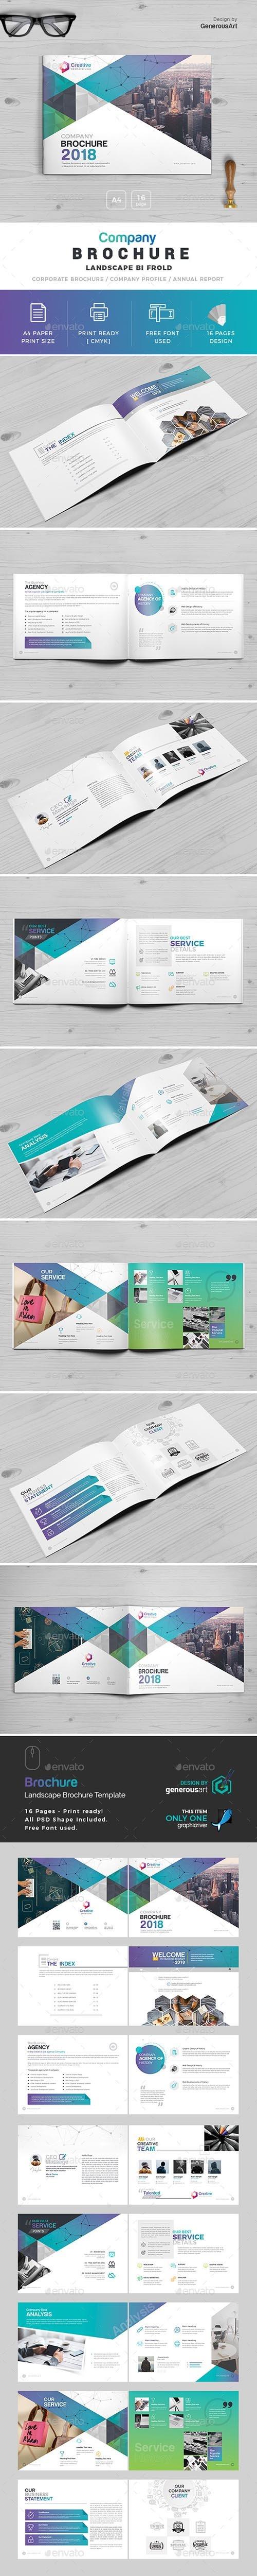 GR - Company Landscape Brochure 21494479